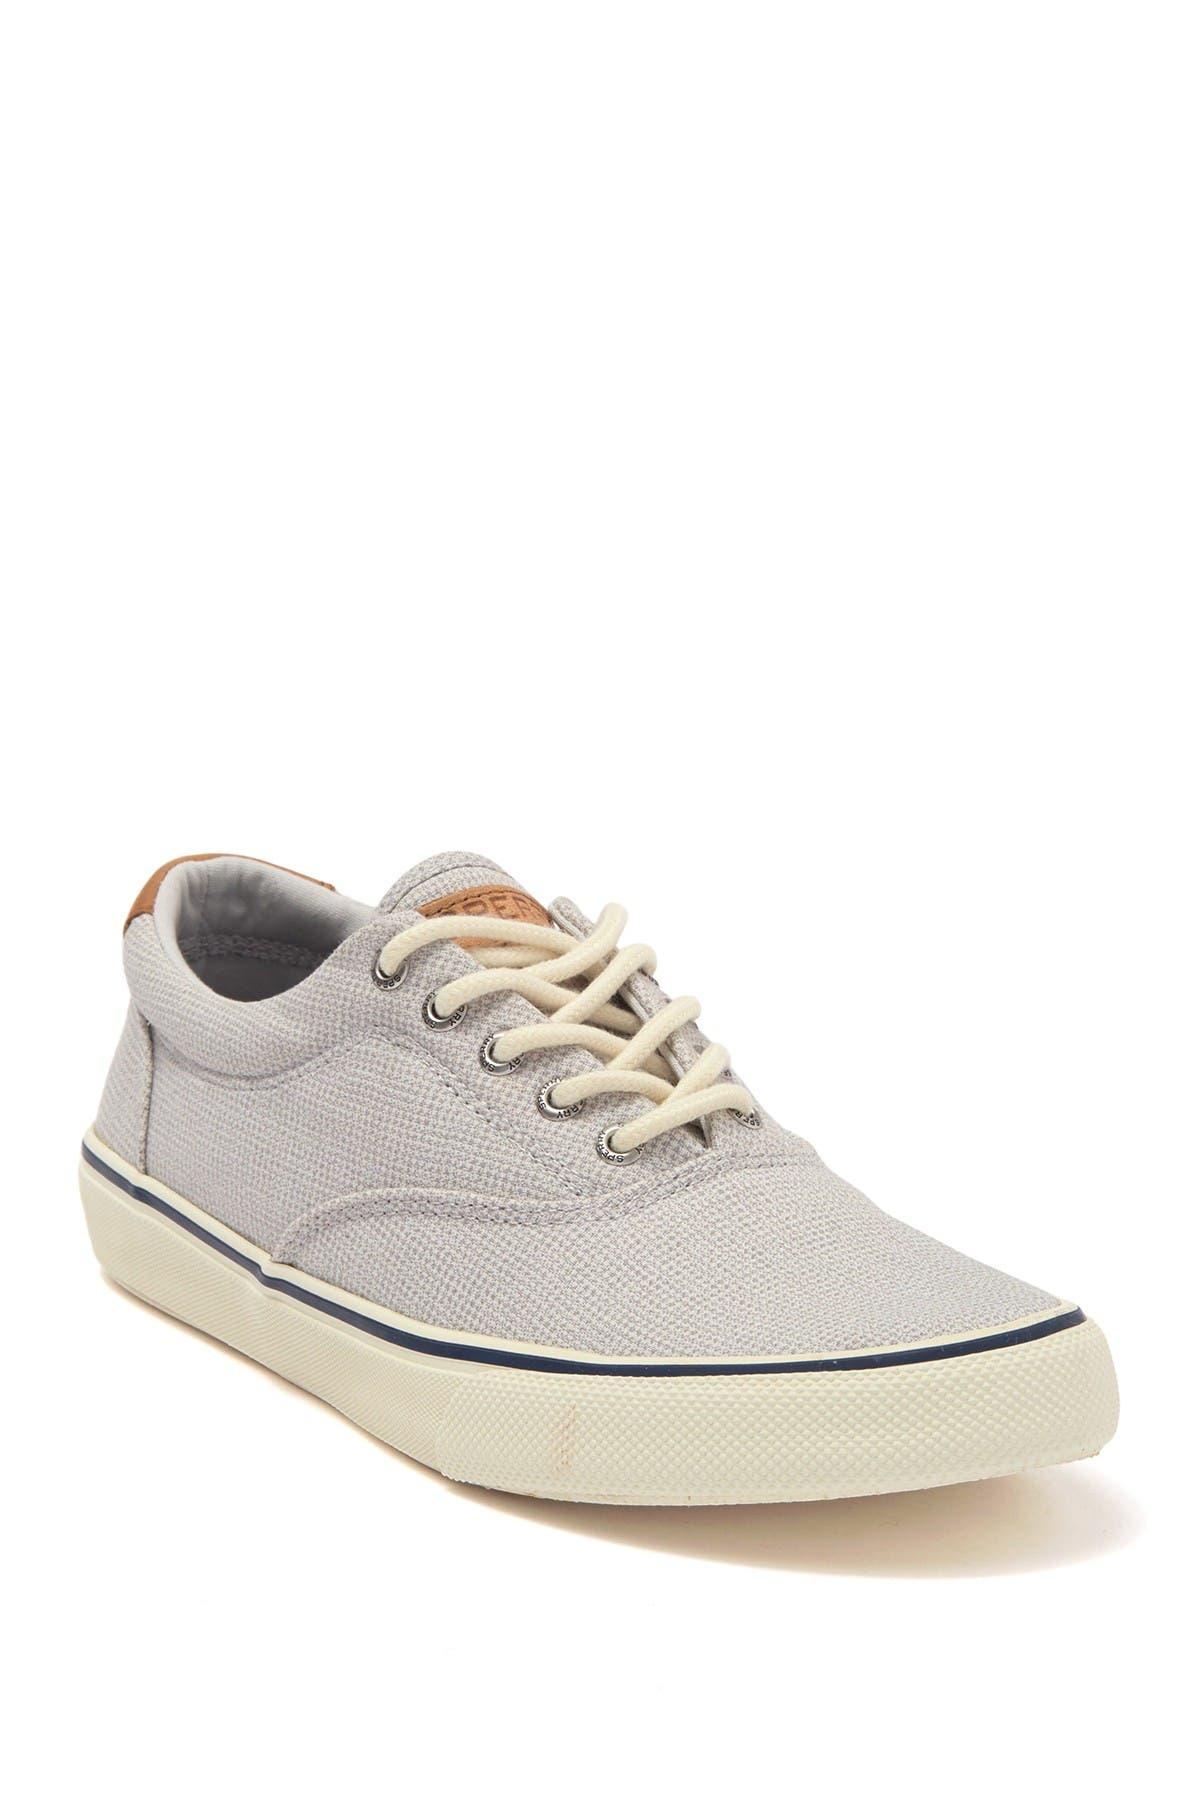 Image of Sperry Striper II CVO Canvas Sneaker